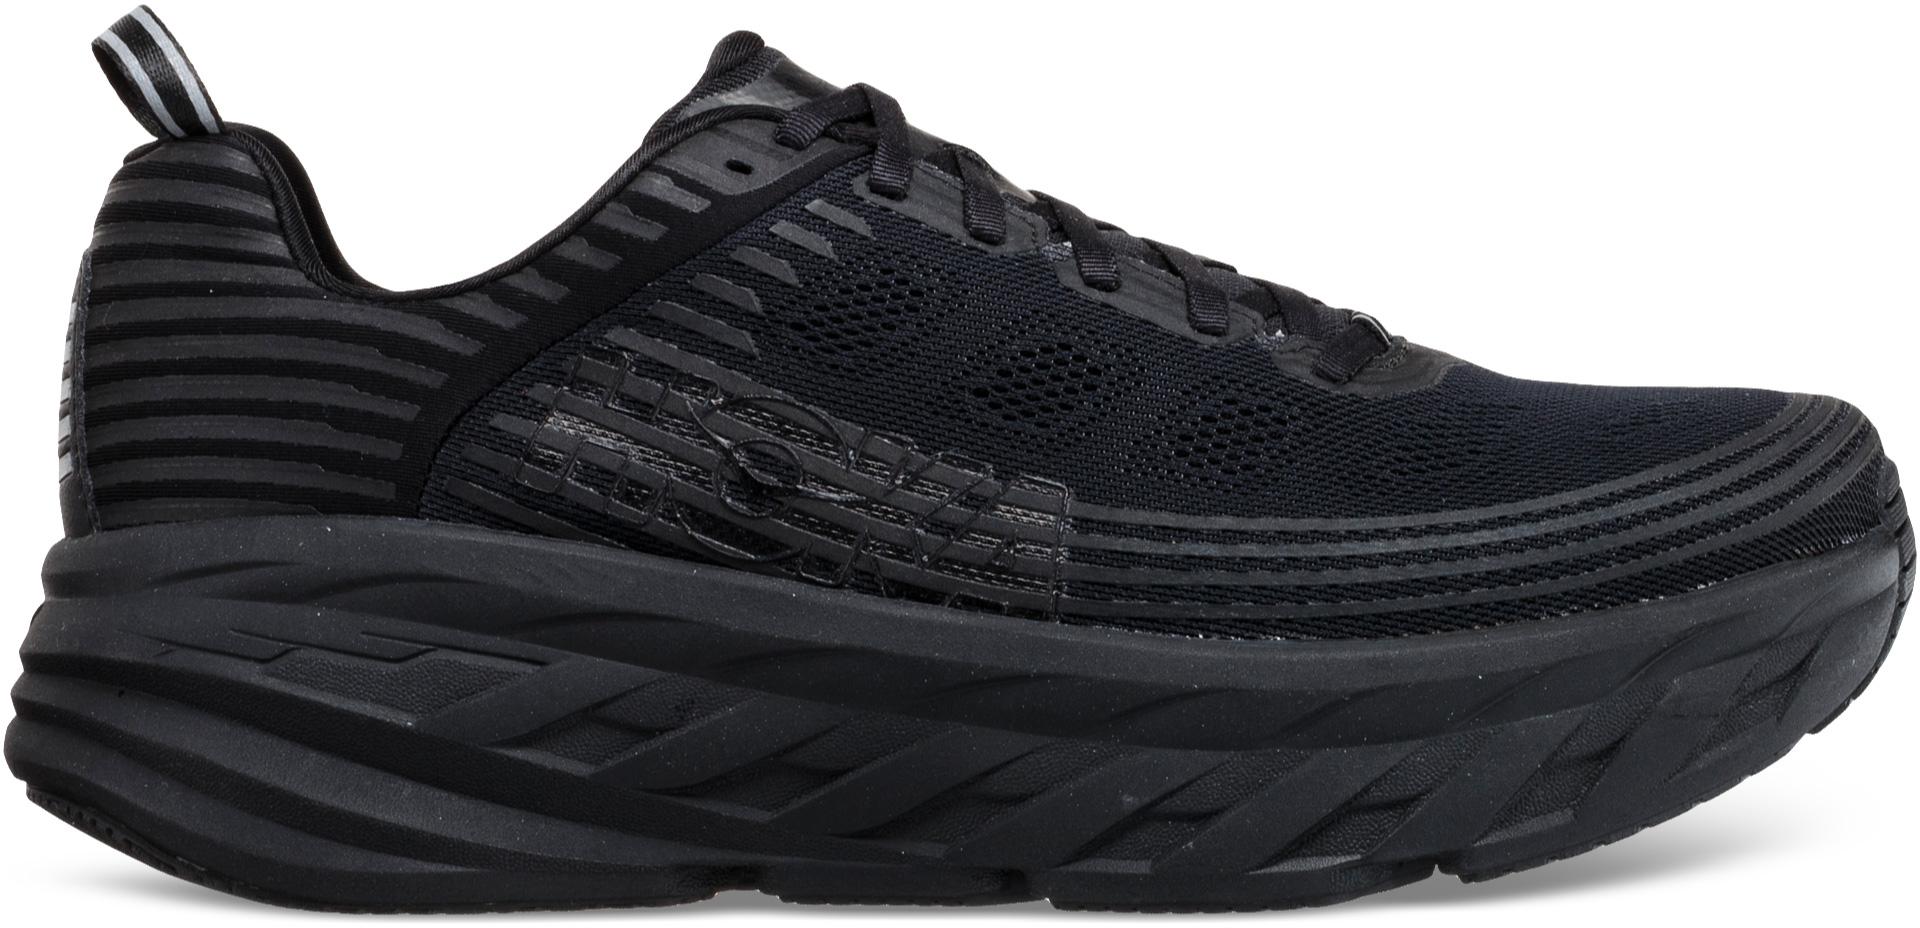 b2ae9fd40863c Running shoes